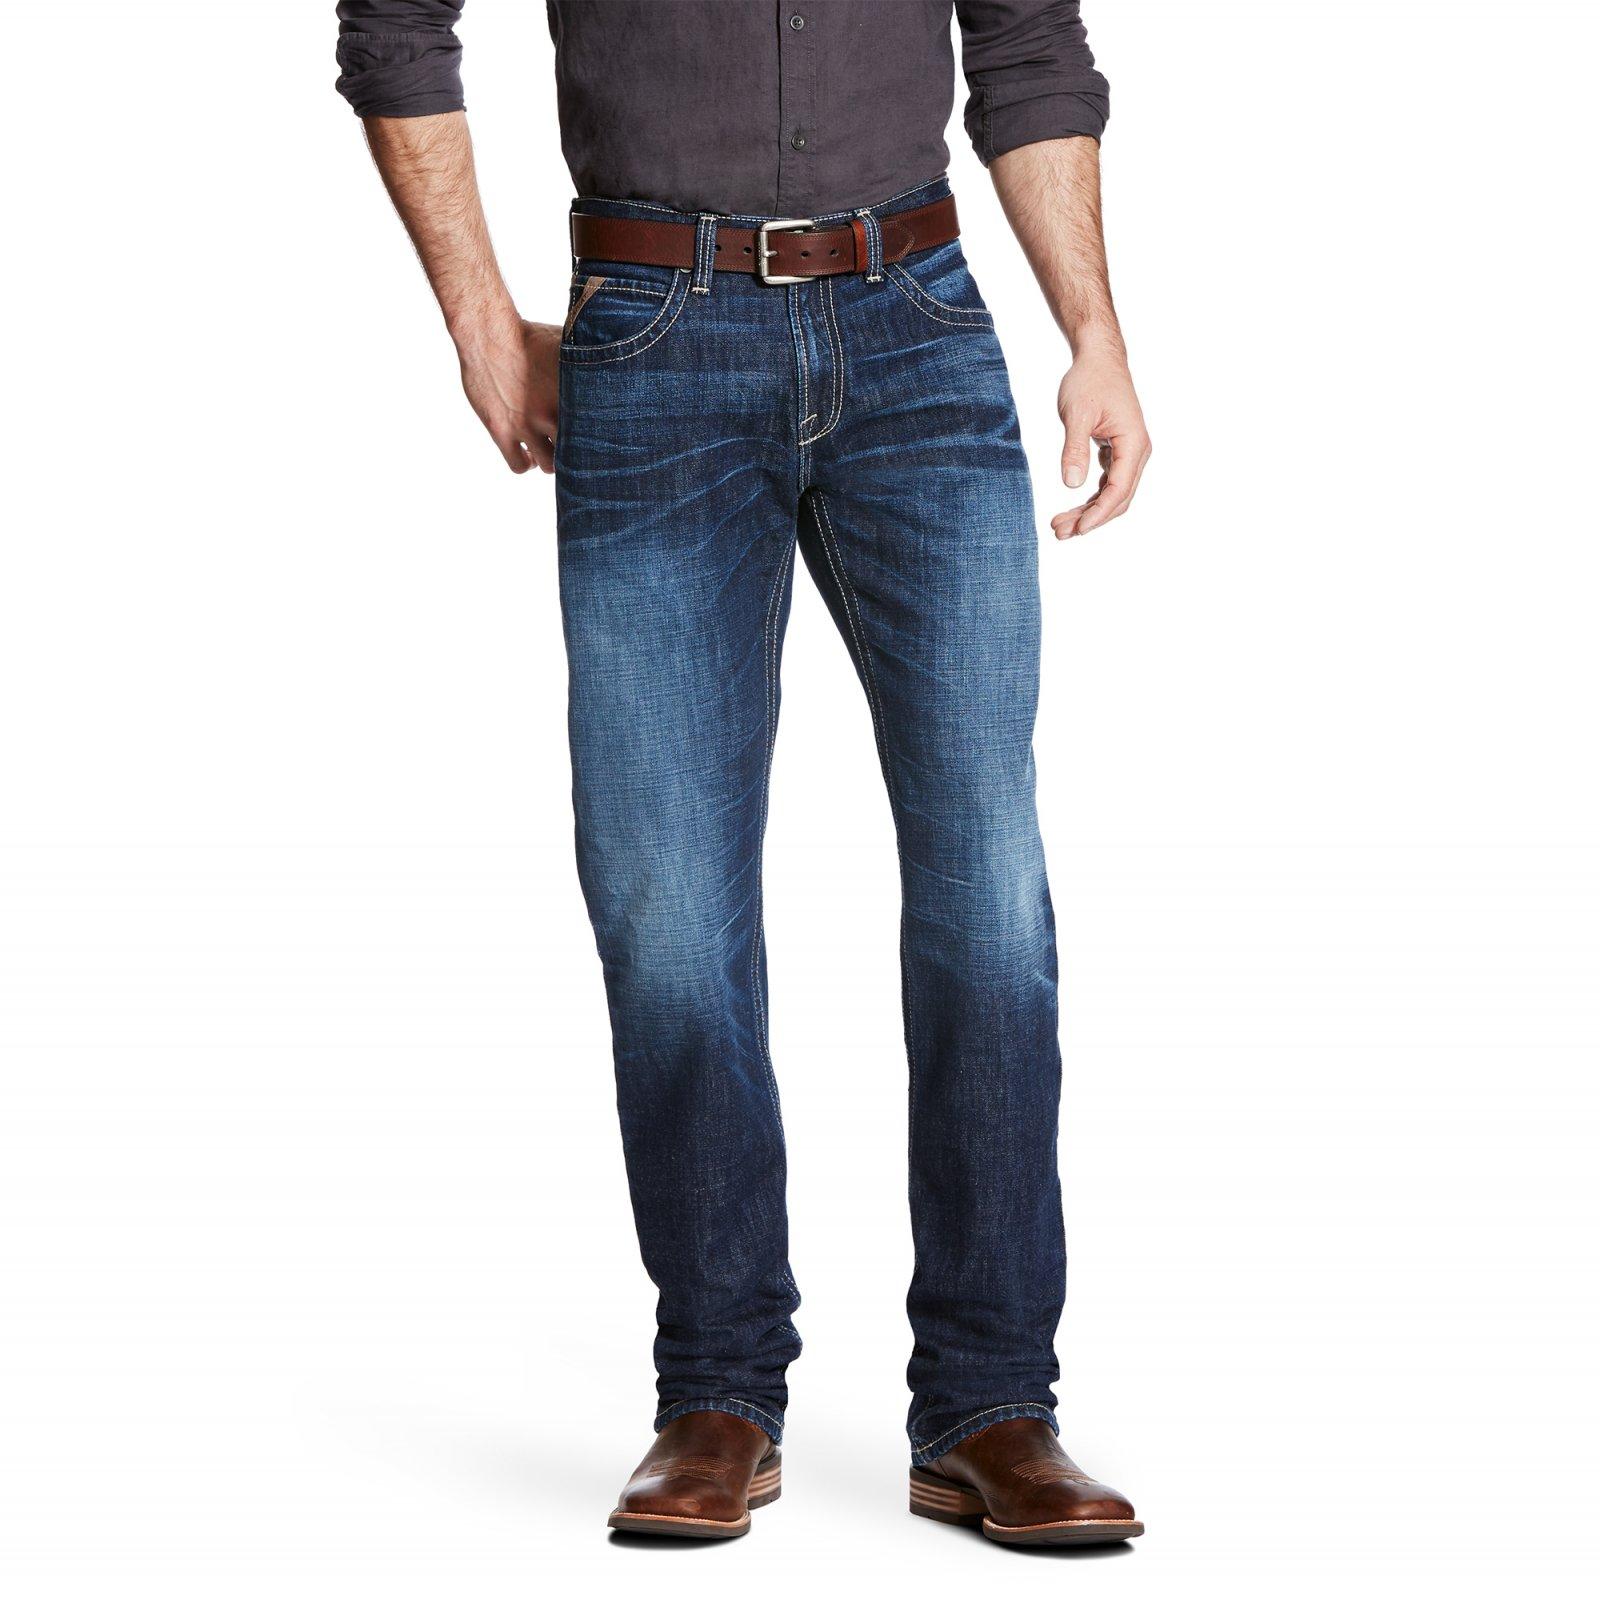 Men's M2 Pioneer Jean from Ariat